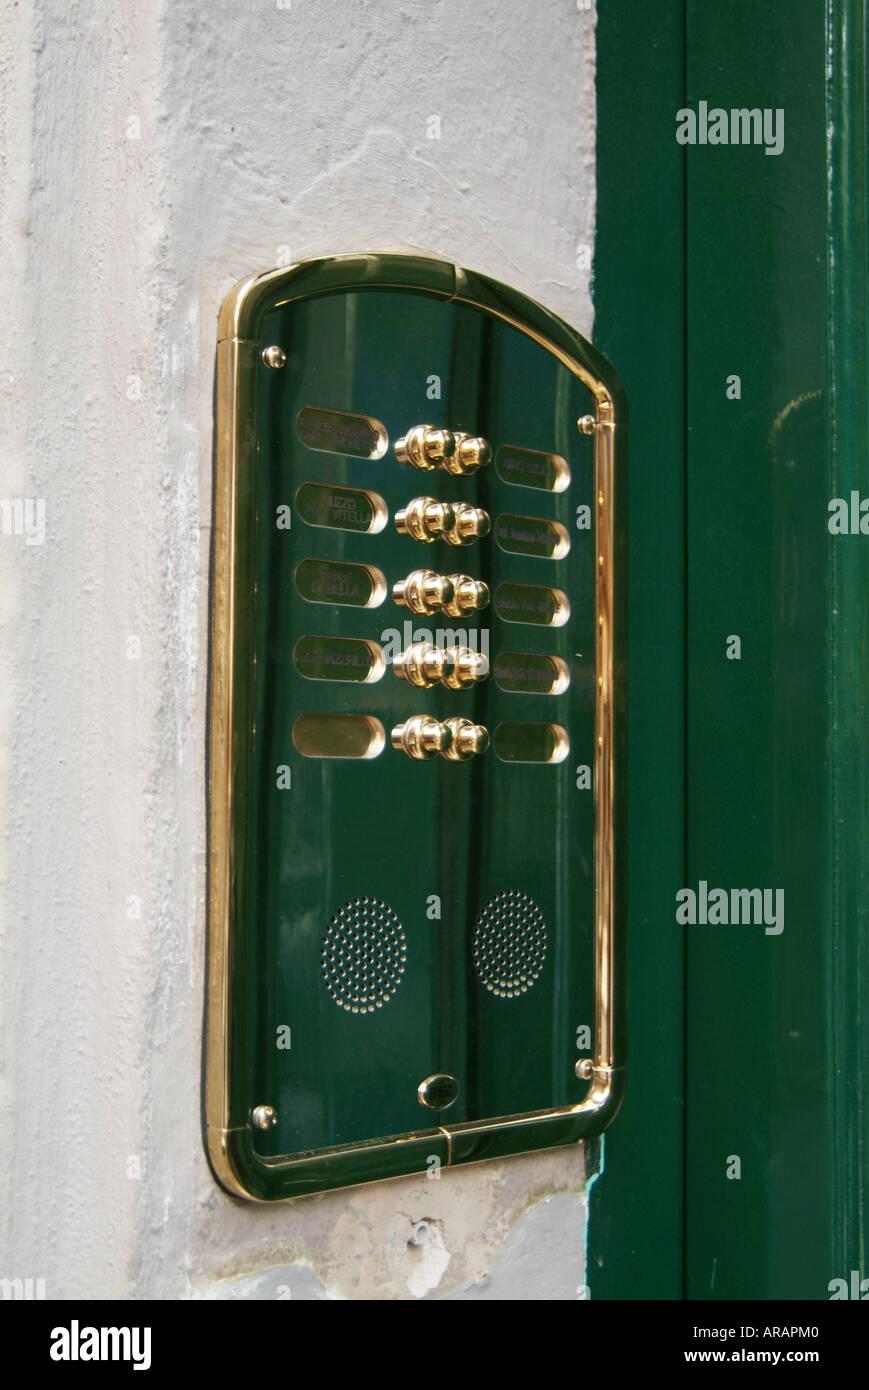 door bell intercom buzzer apartment flat block off